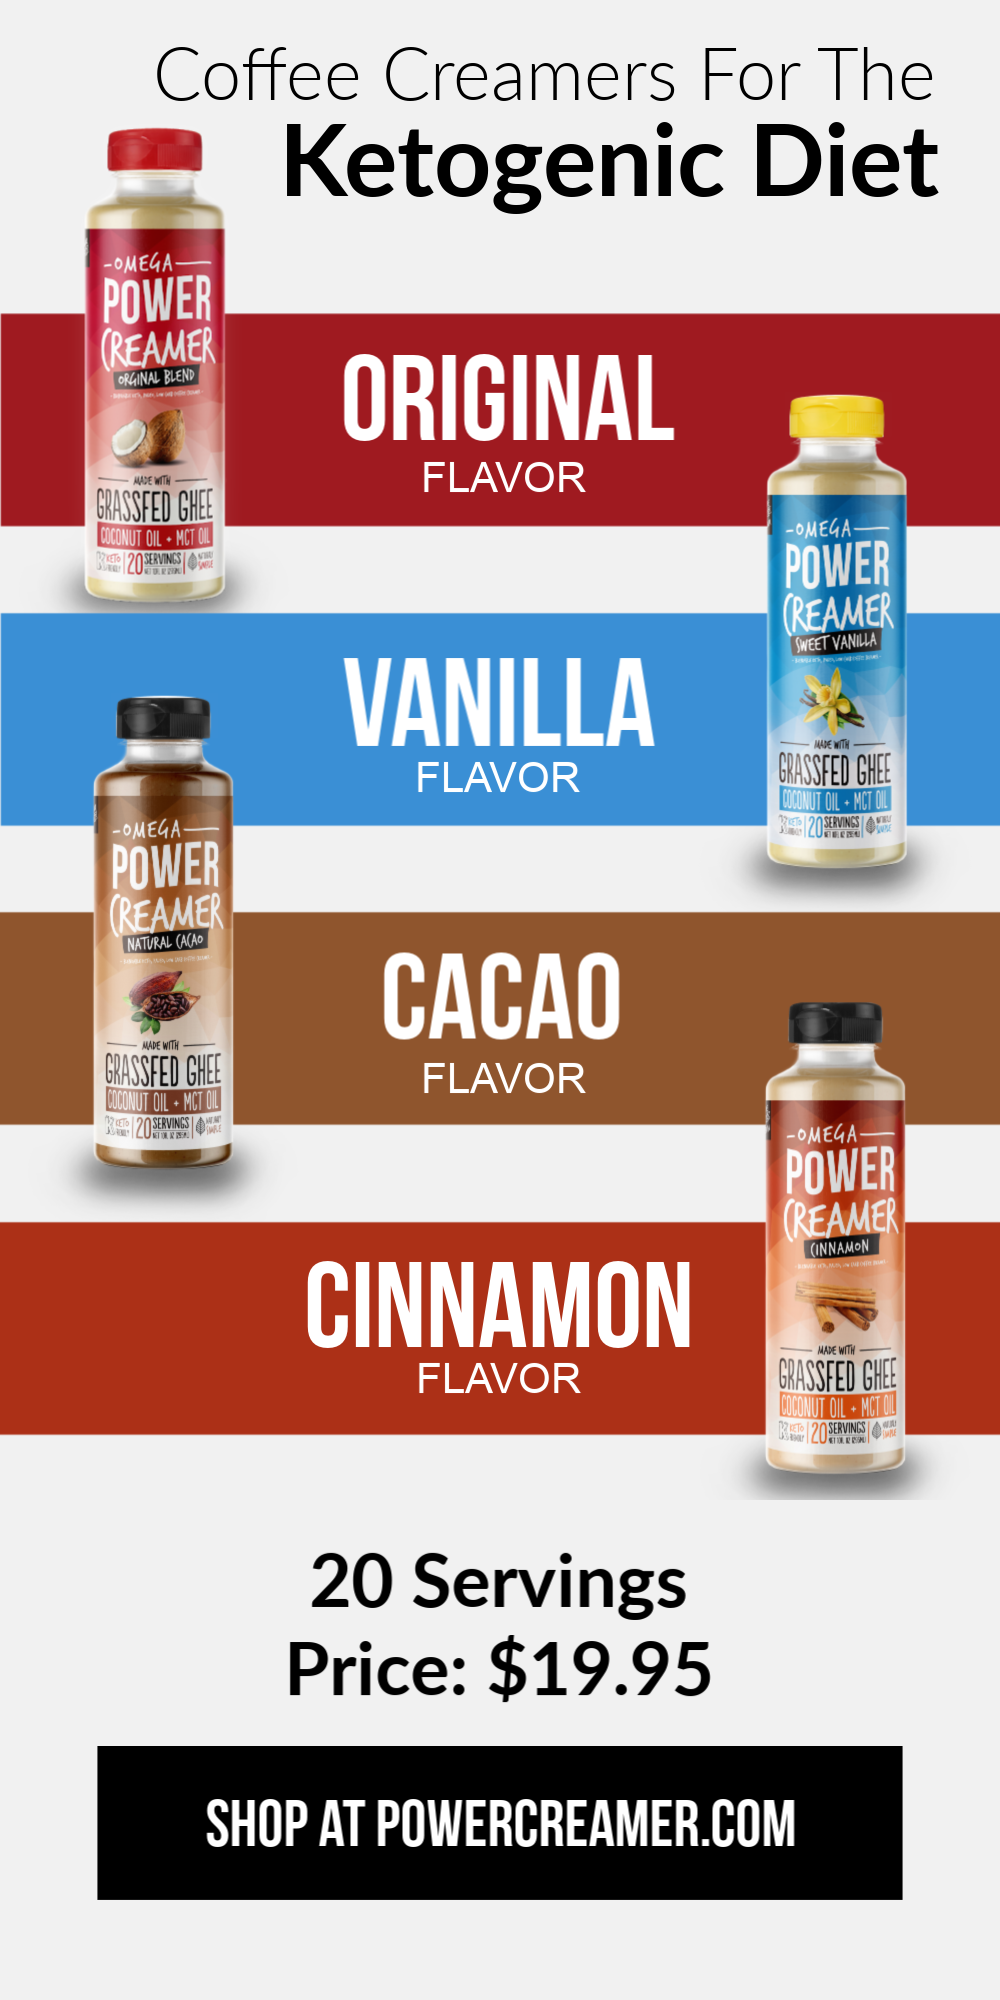 Omega PowerCreamer makes an easy Keto Coffee! Just add 1